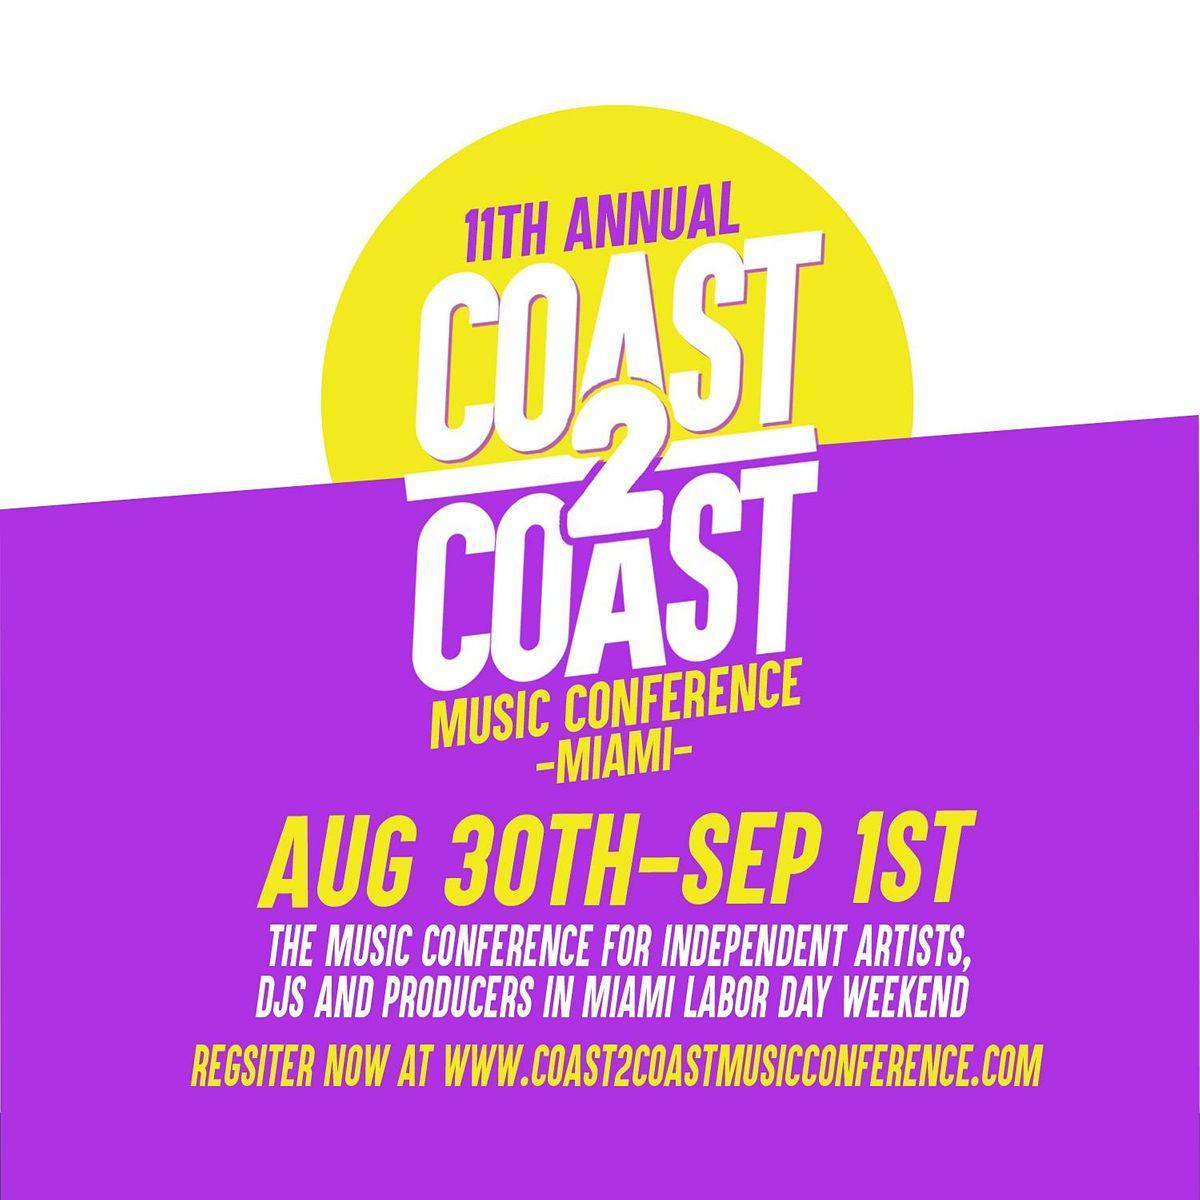 COAST 2 COAST MUSIC CONFERENCE 2021